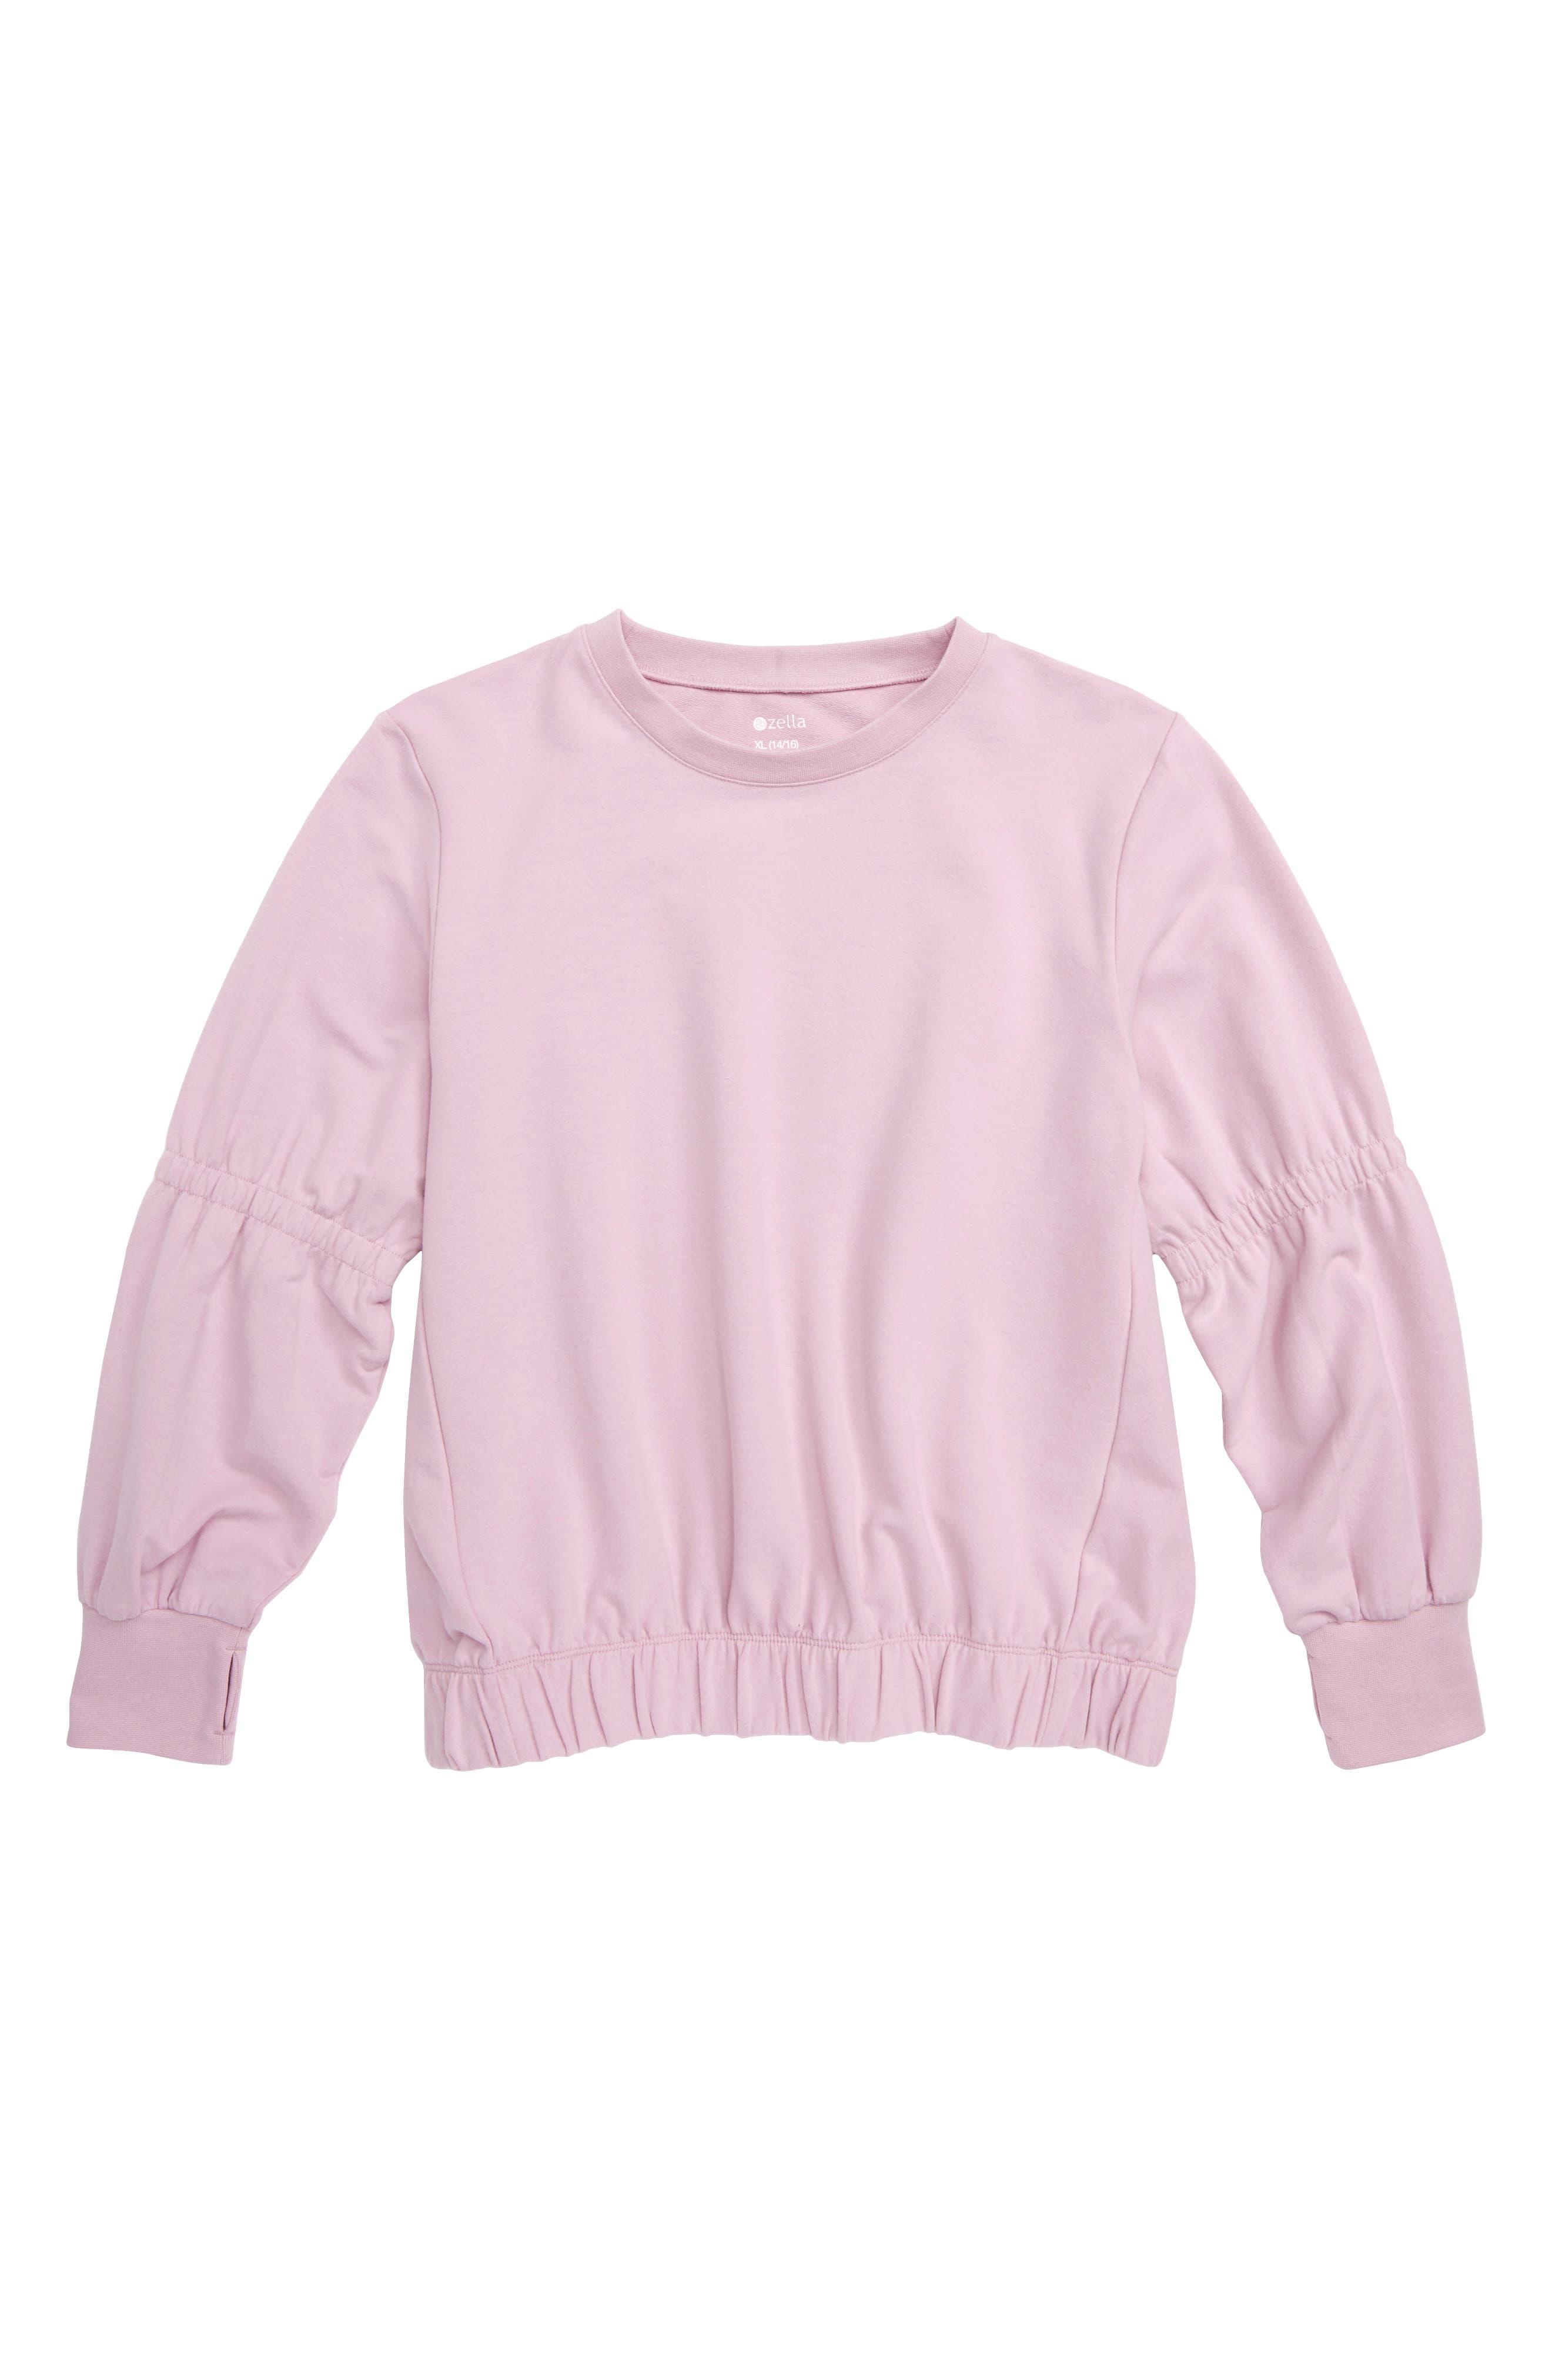 ZELLA GIRL, Gathered Sleeve Pullover, Main thumbnail 1, color, 530